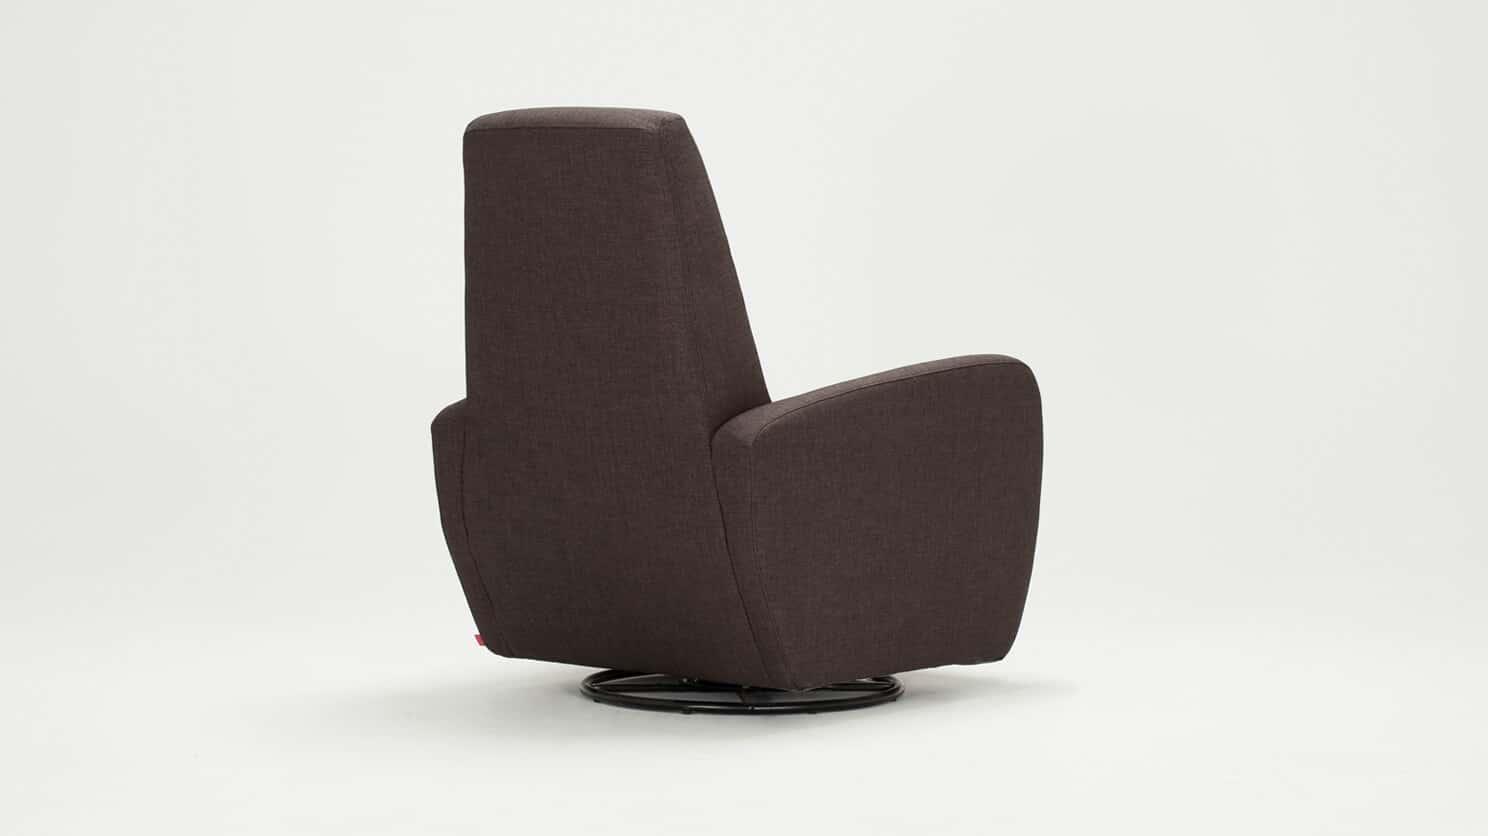 30073 71 6 chairs karbon swivel chair polo slate back corner 01